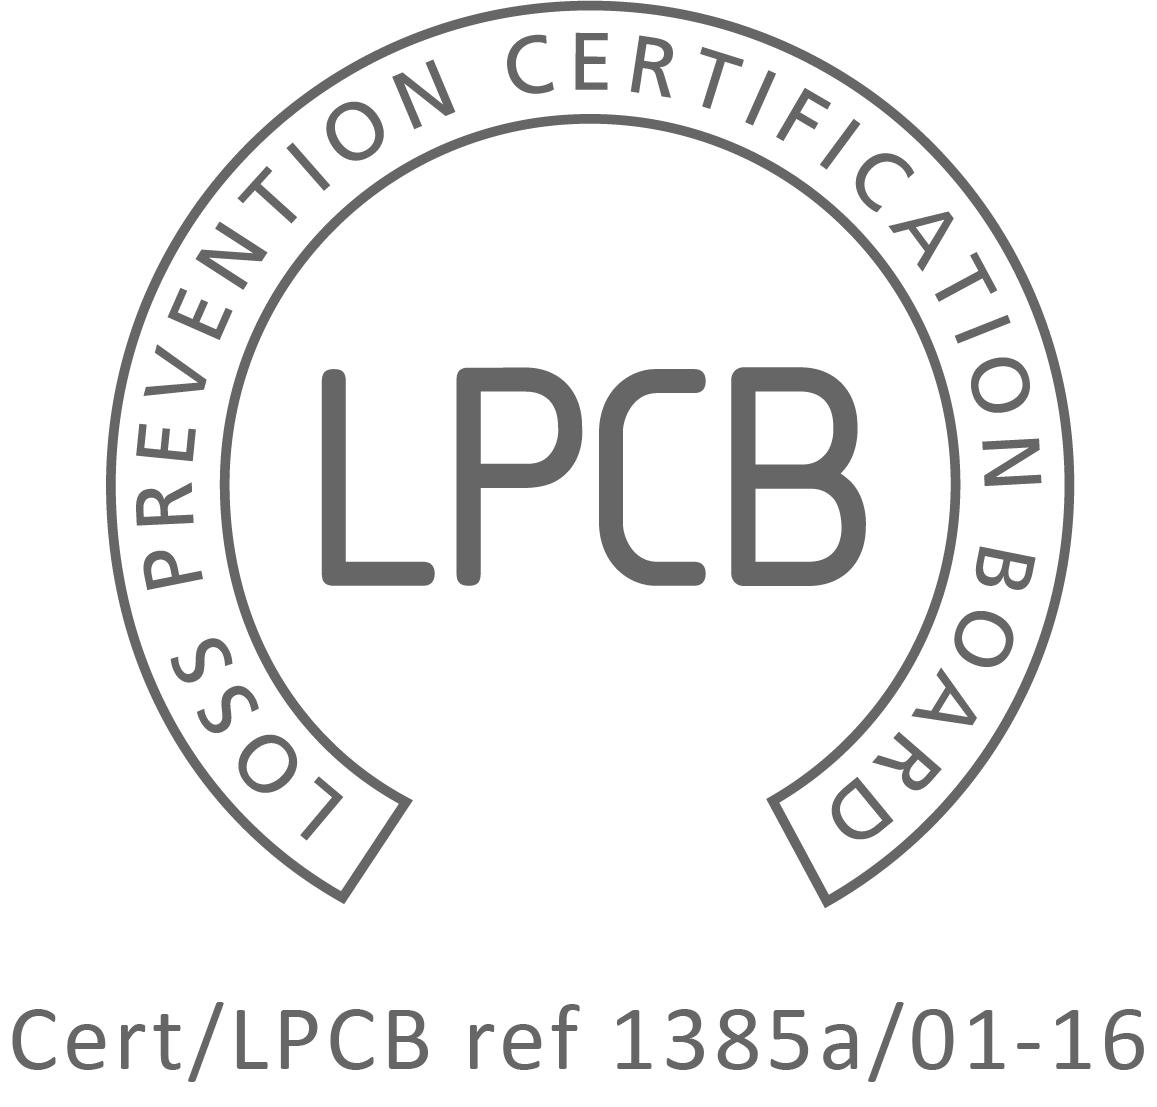 lpcb-logo-mid-grey-1385a-01-16.jpg